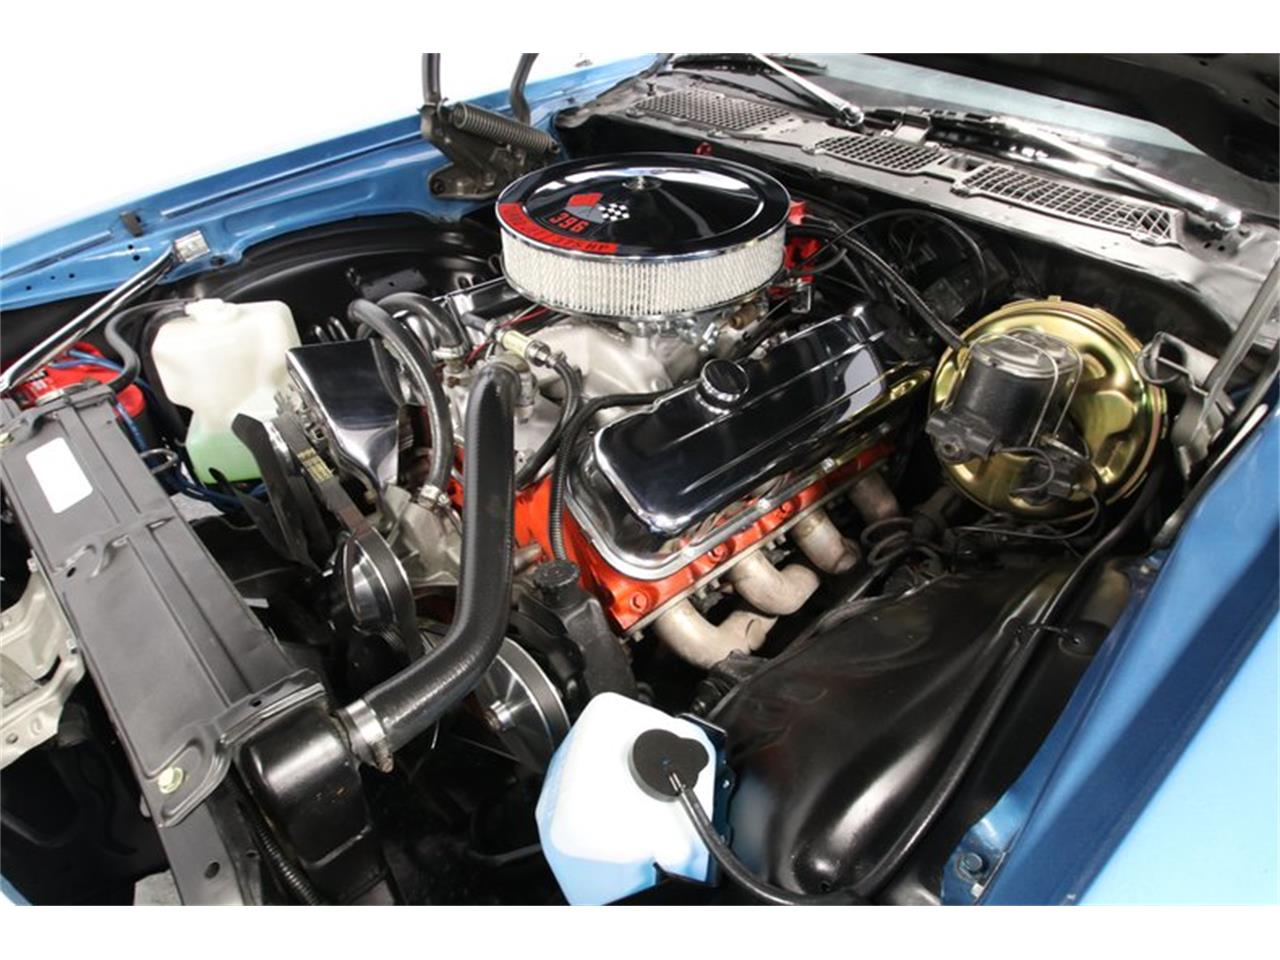 Large Picture of Classic 1970 Camaro located in Concord North Carolina - $36,995.00 - QRKC